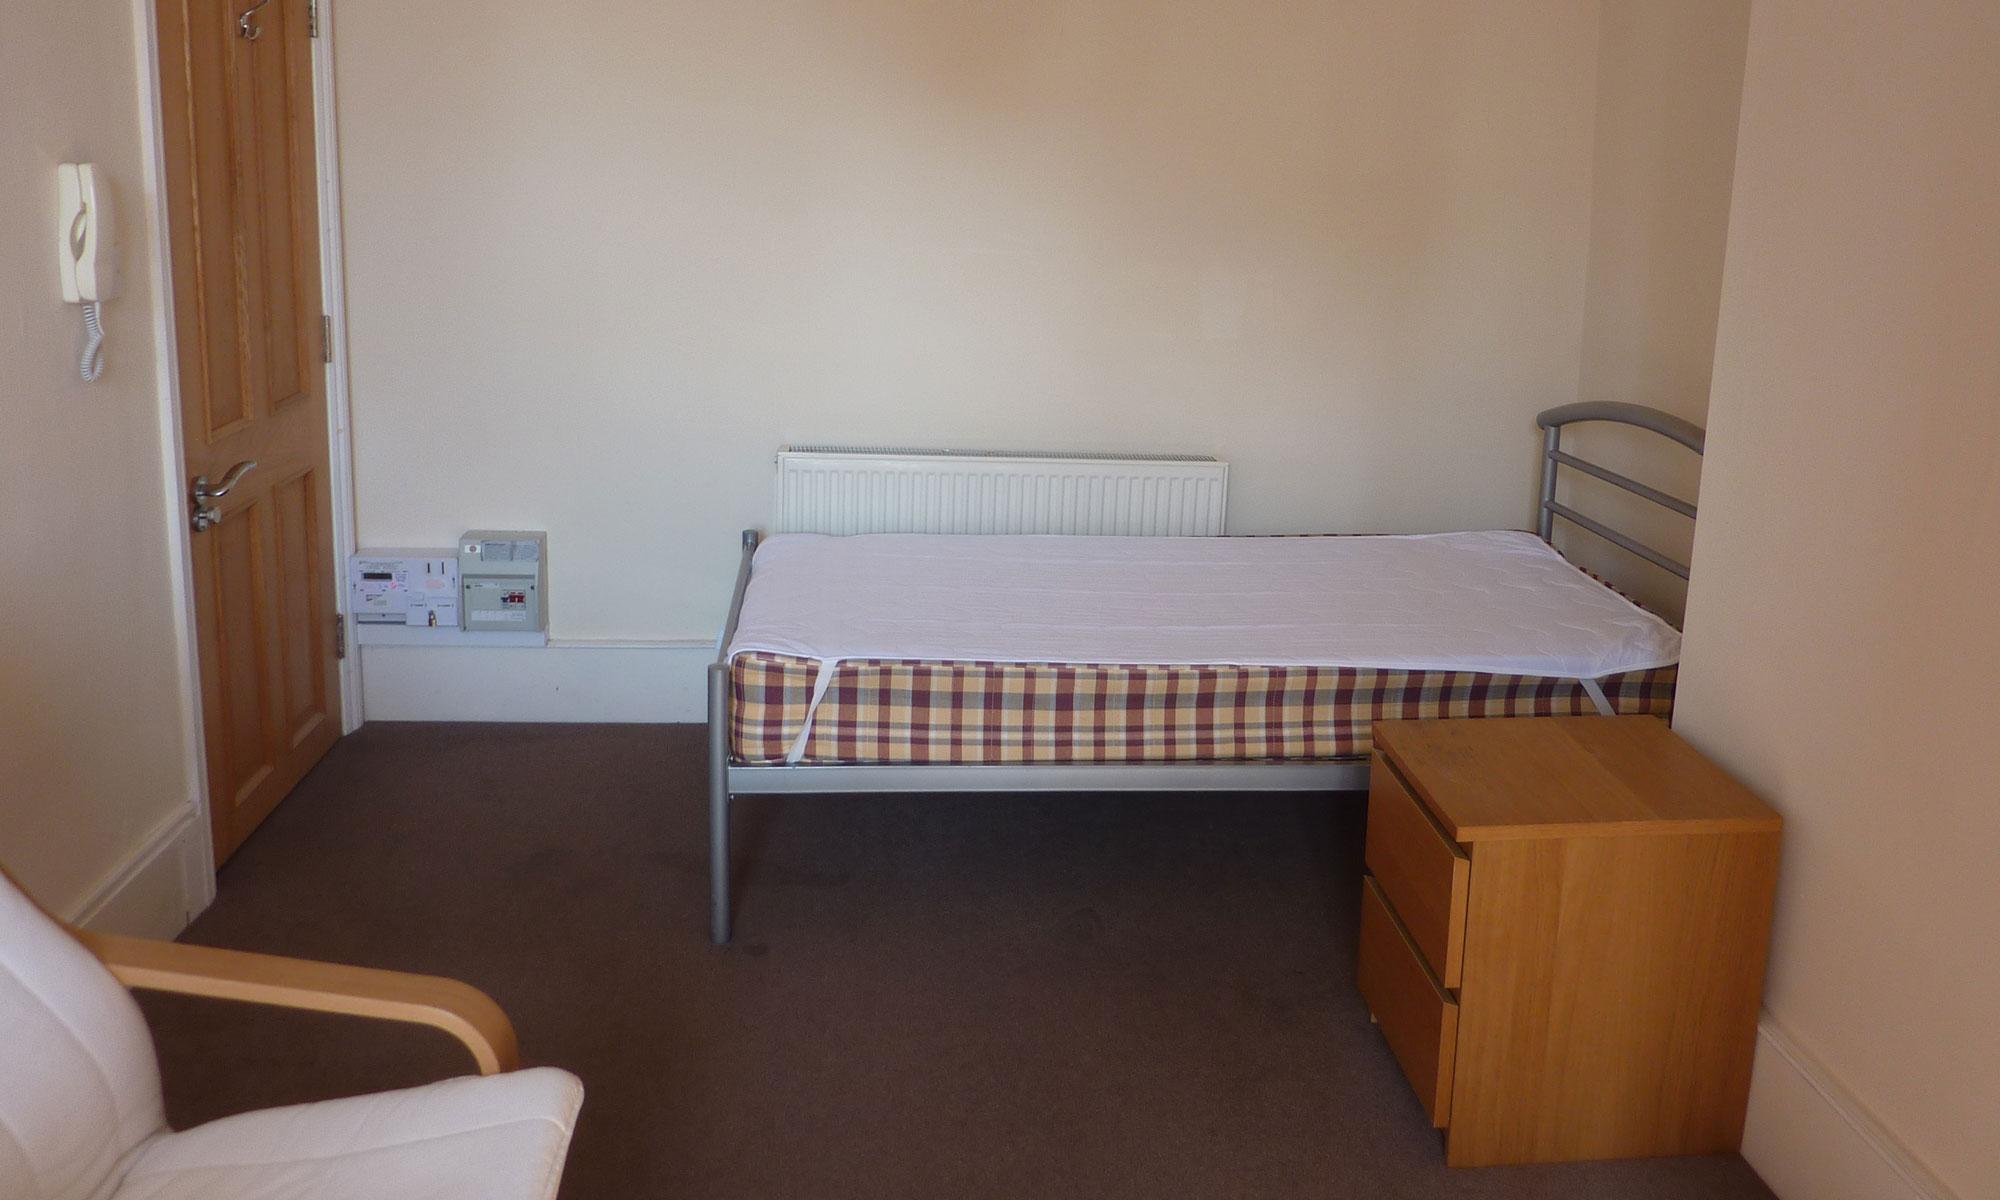 Bedford-square-bedroom-2